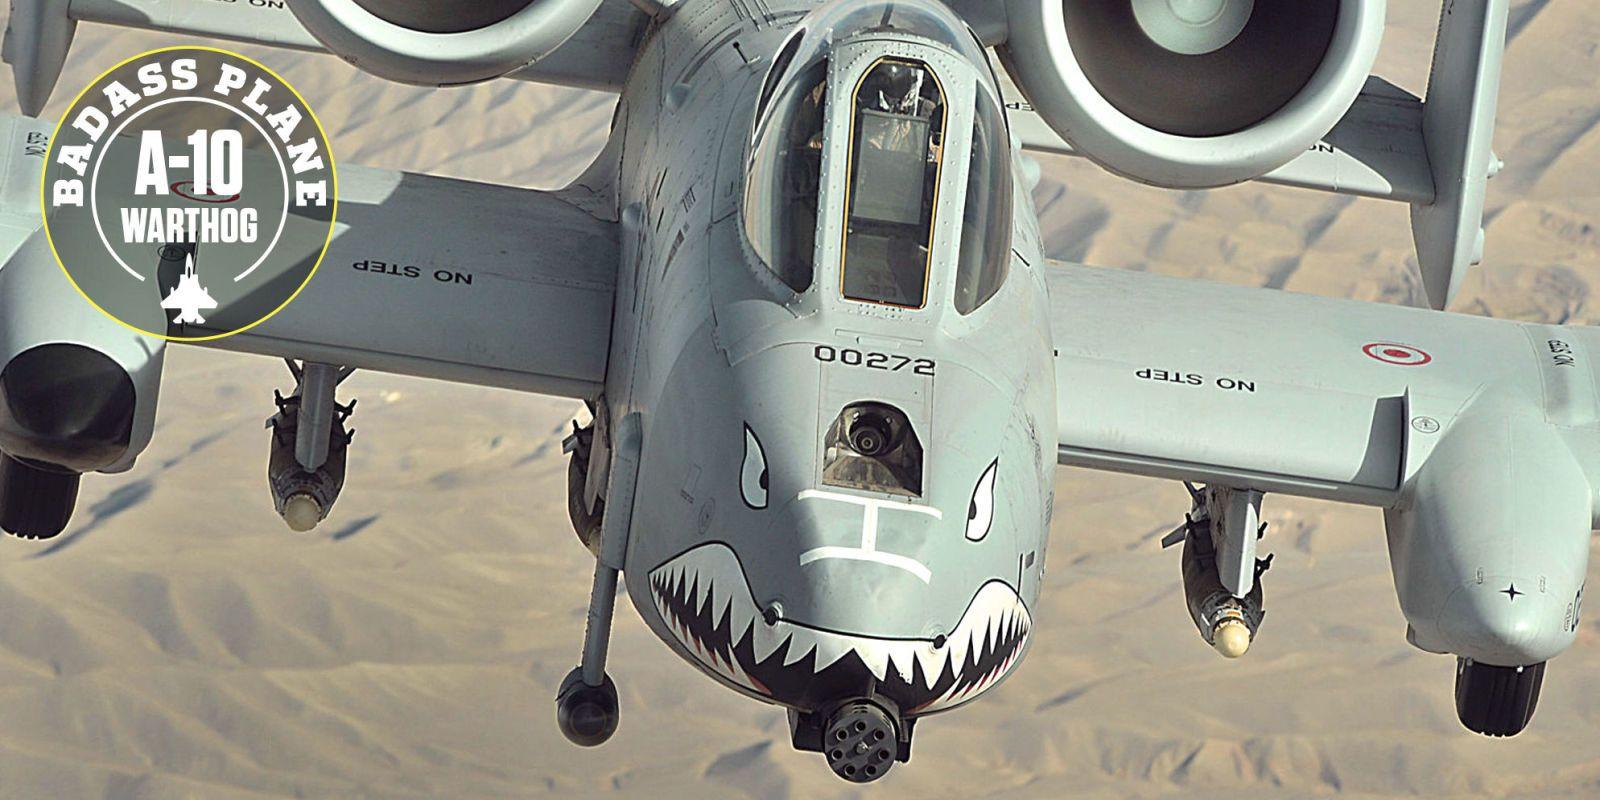 Why The A 10 Warthog Is Such A Badass Plane